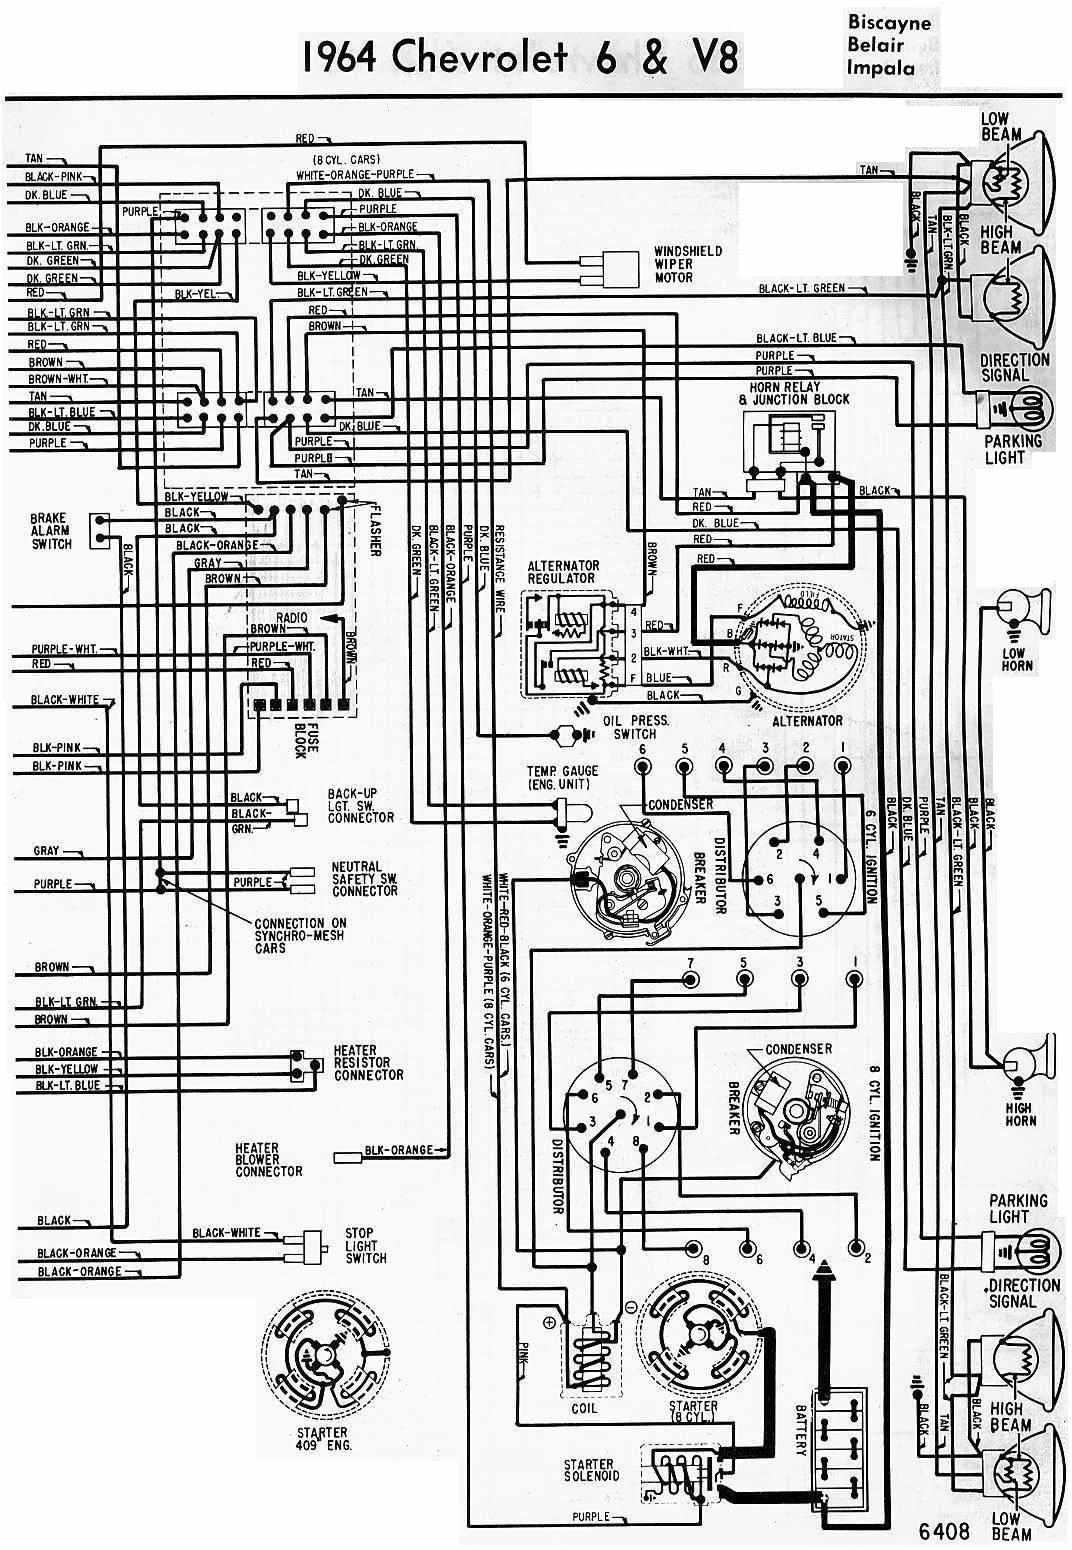 Incredible 63 Corvair Wiring Diagram Basic Electronics Wiring Diagram Wiring Cloud Mousmenurrecoveryedborg